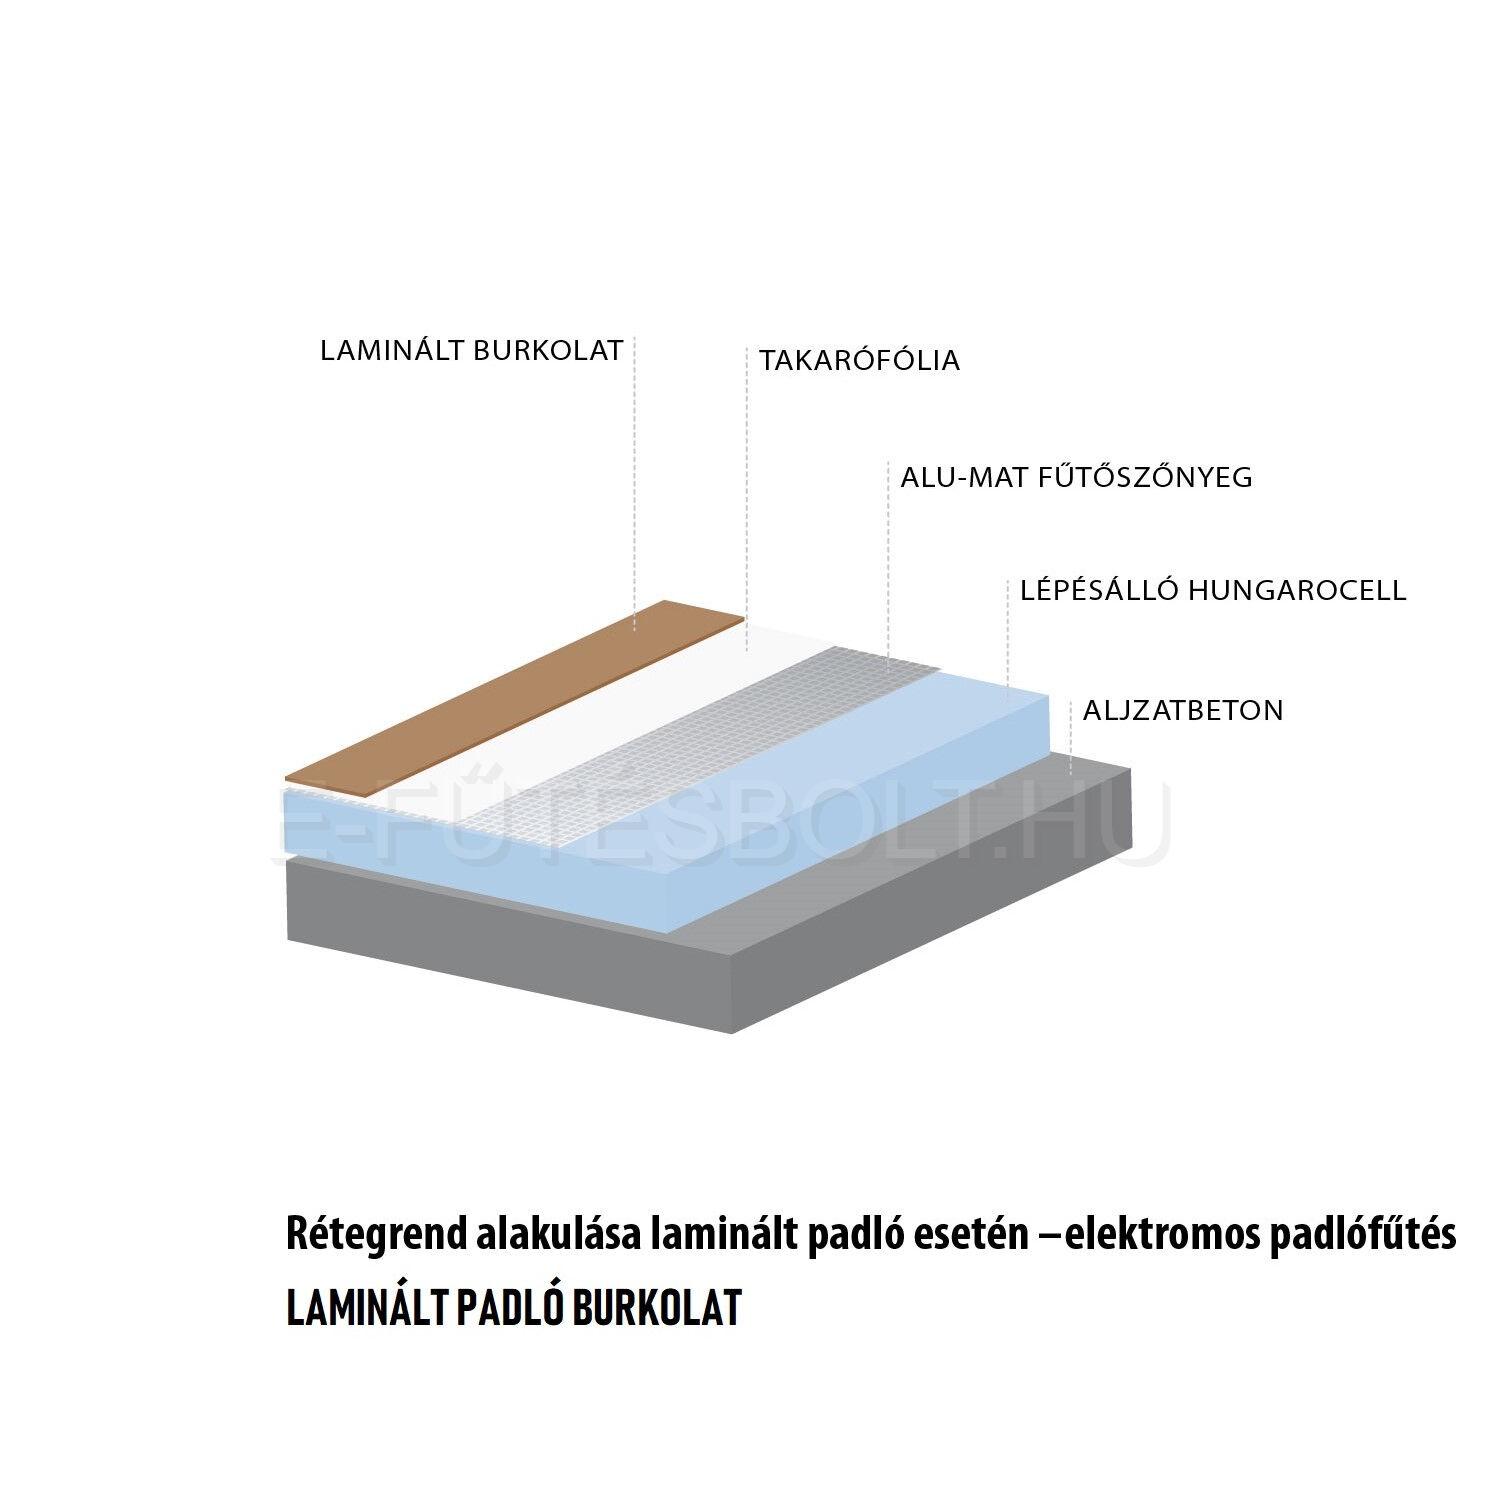 FALCON U-HEAT Alu-Mat fűtőszőnyeg rétegrend